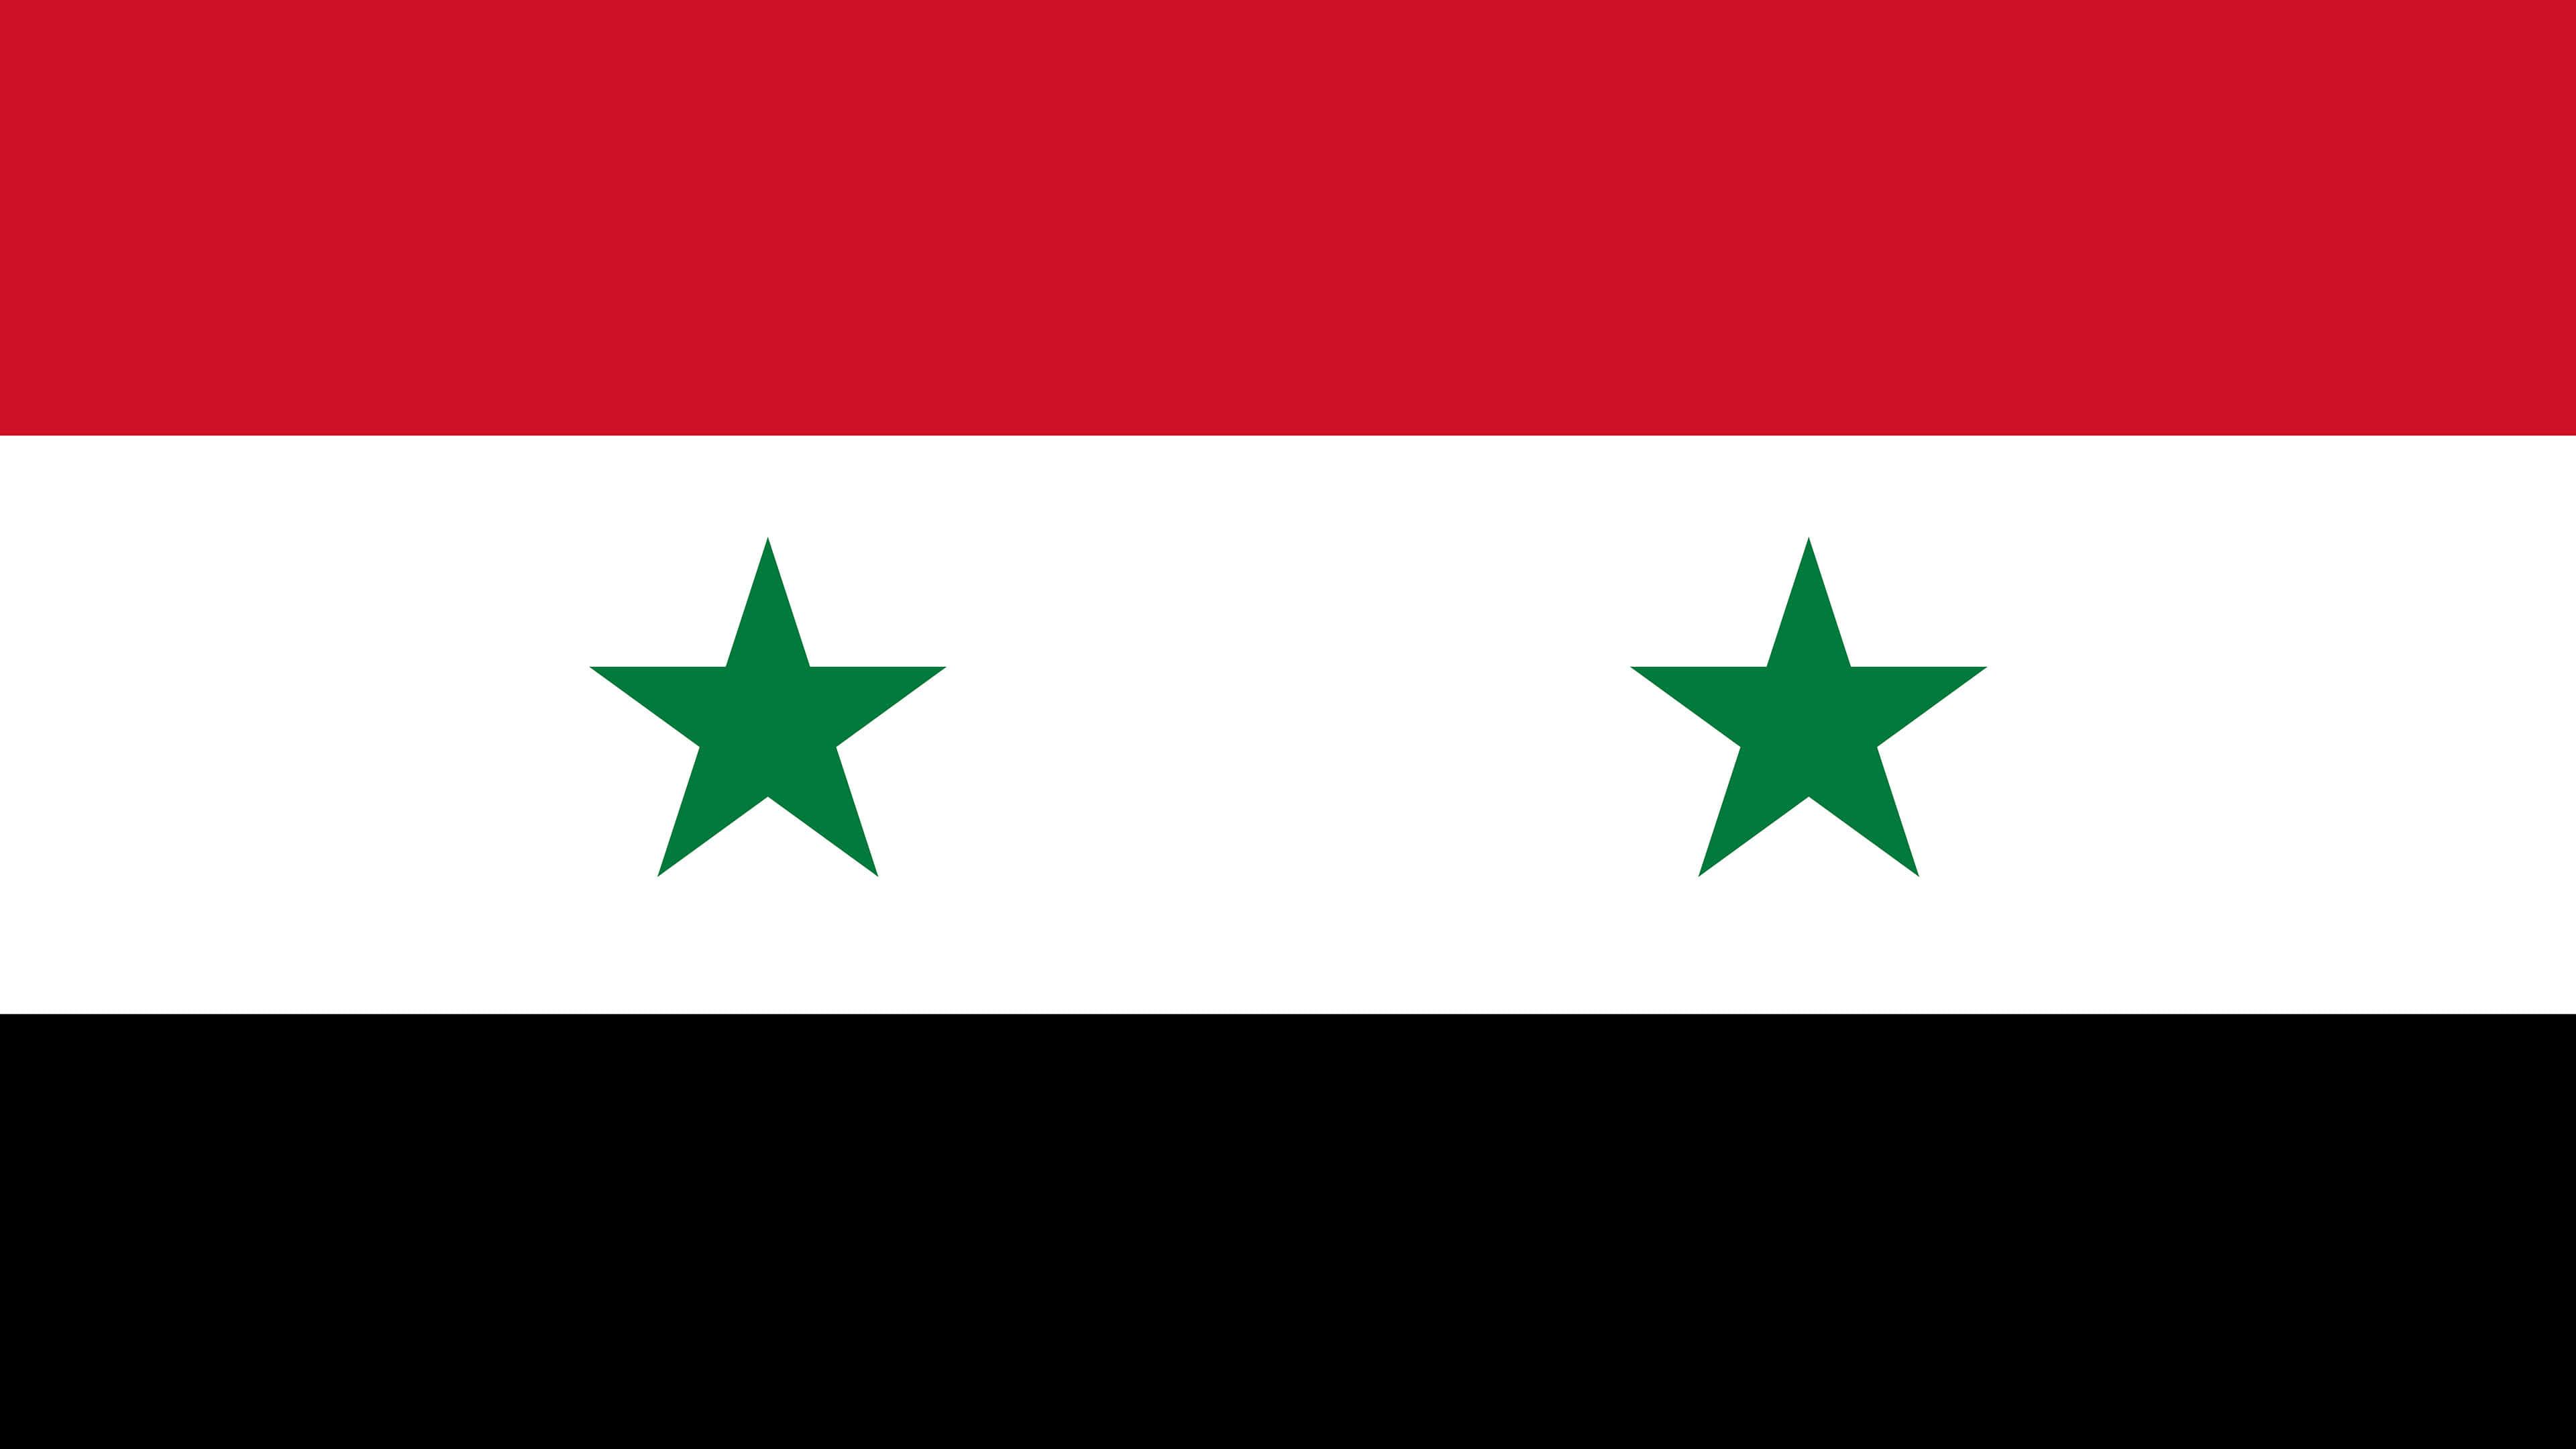 Syria Flag UHD 4K Wallpaper Pixelz 3840x2160